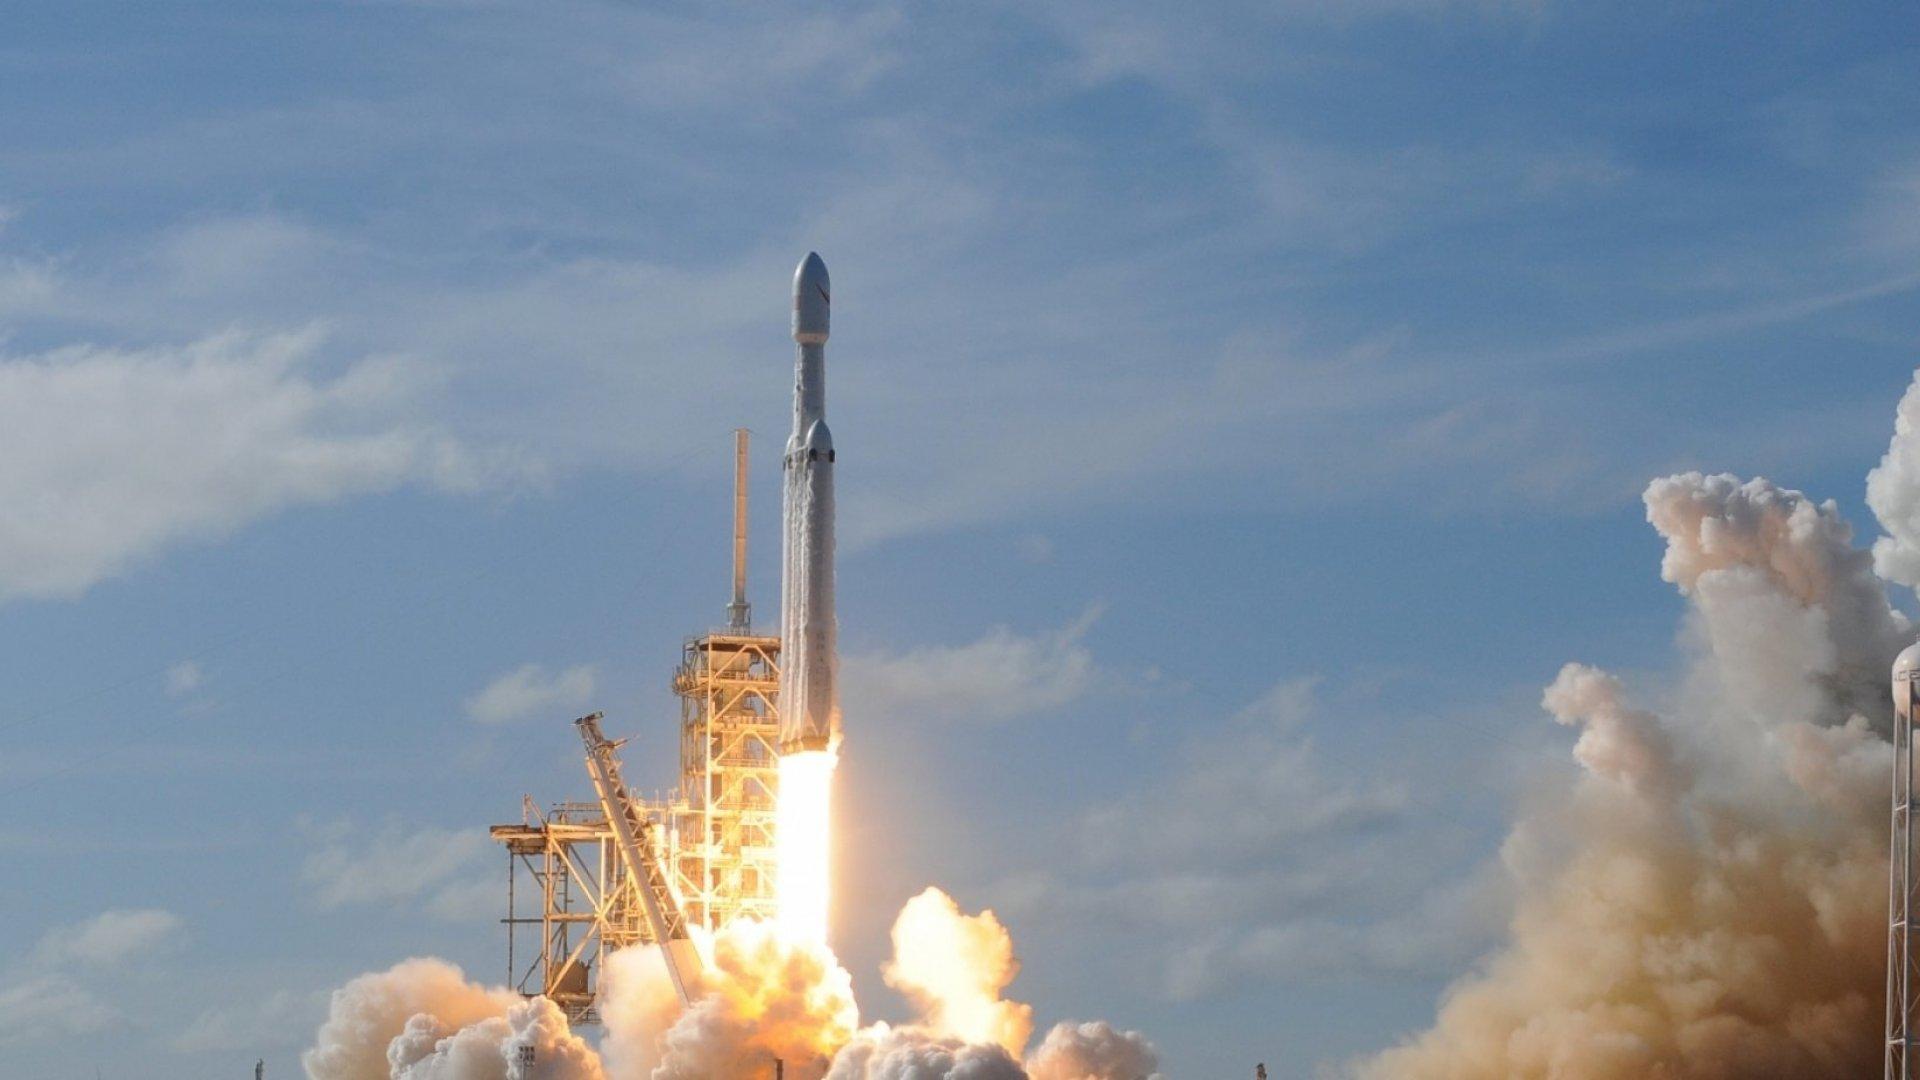 Elon Musk, Jeff Bezos, and Bad Science Fiction